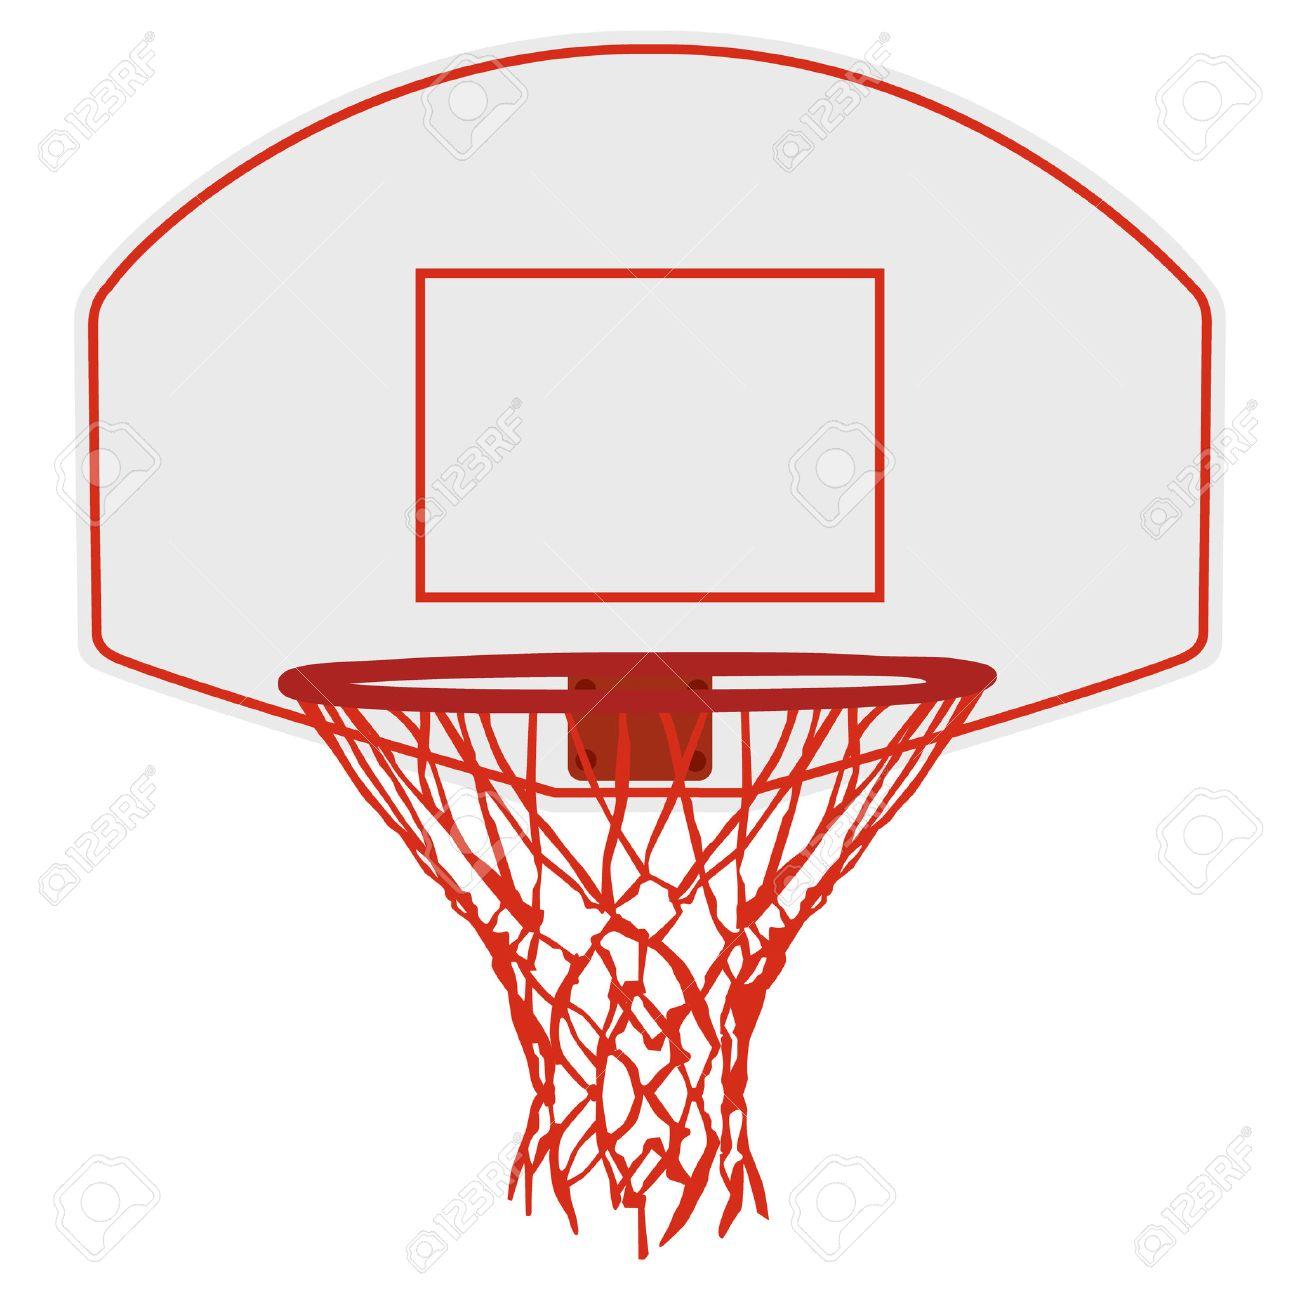 Vector illustration basketball basket, basketball hoop, basketball net. Basketball icon - 52951196